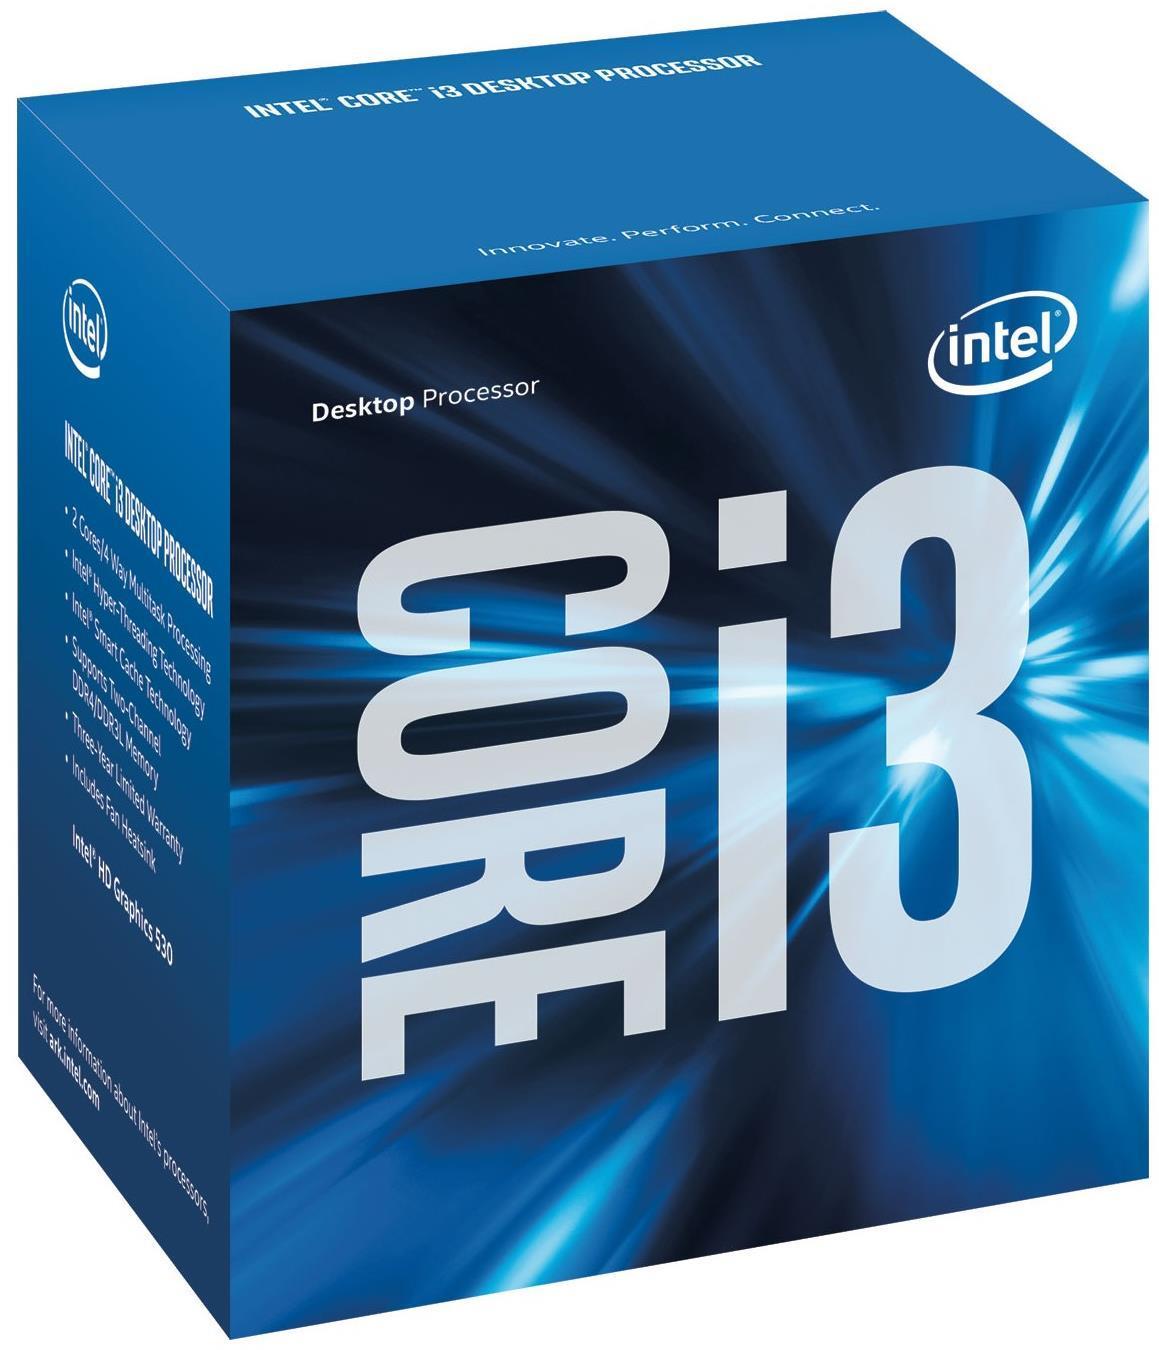 Intel Core I7 7700 360ghz Socket 1151 Cpu Processor Electronic Pentium G4600 36ghz Kabylake I3 7300 400ghz